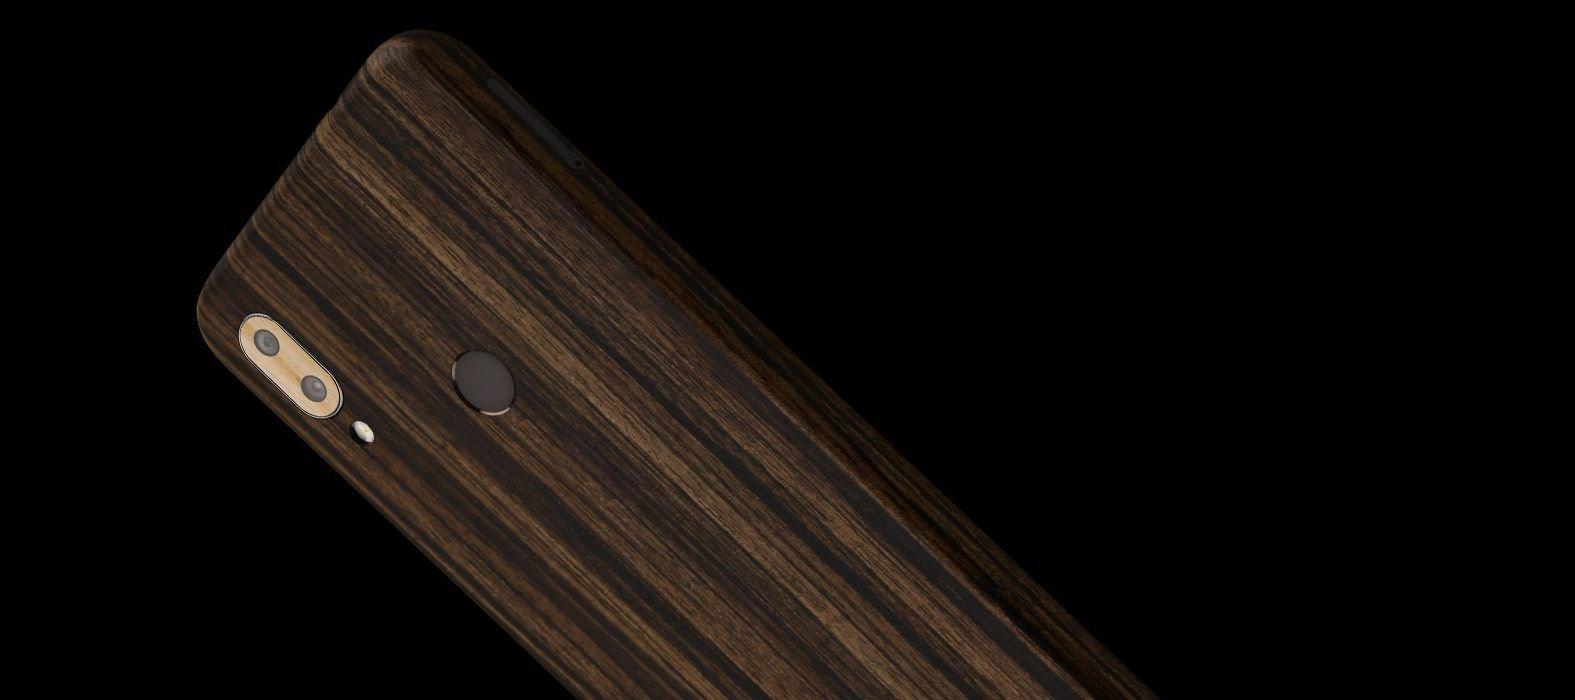 redmi-7_Zebra-Wood_Skins